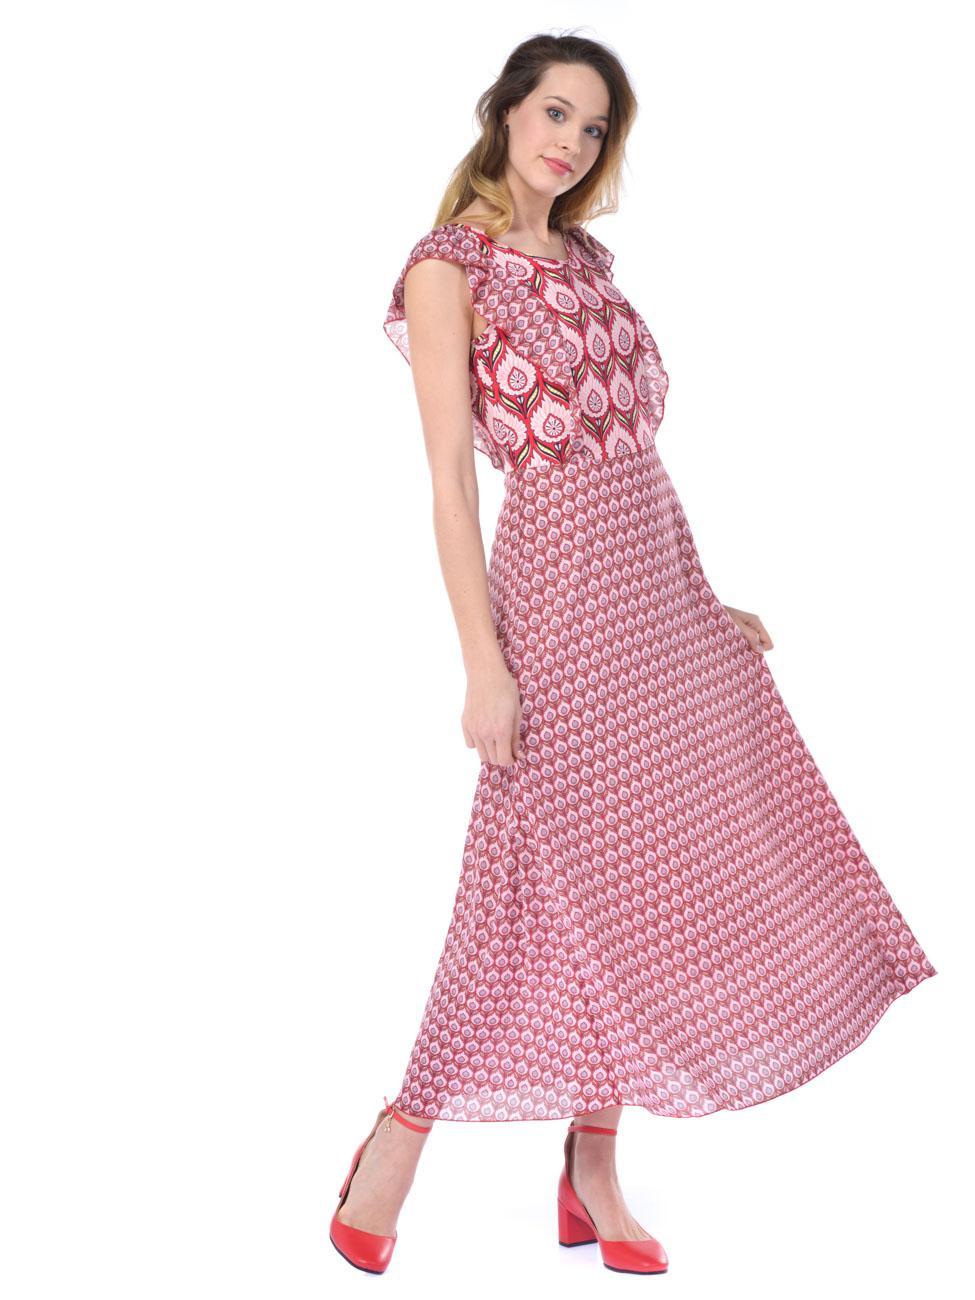 9a7da682a340 Abito lungo donna Silvian Heach con fantasia rosa - RoncaStyle